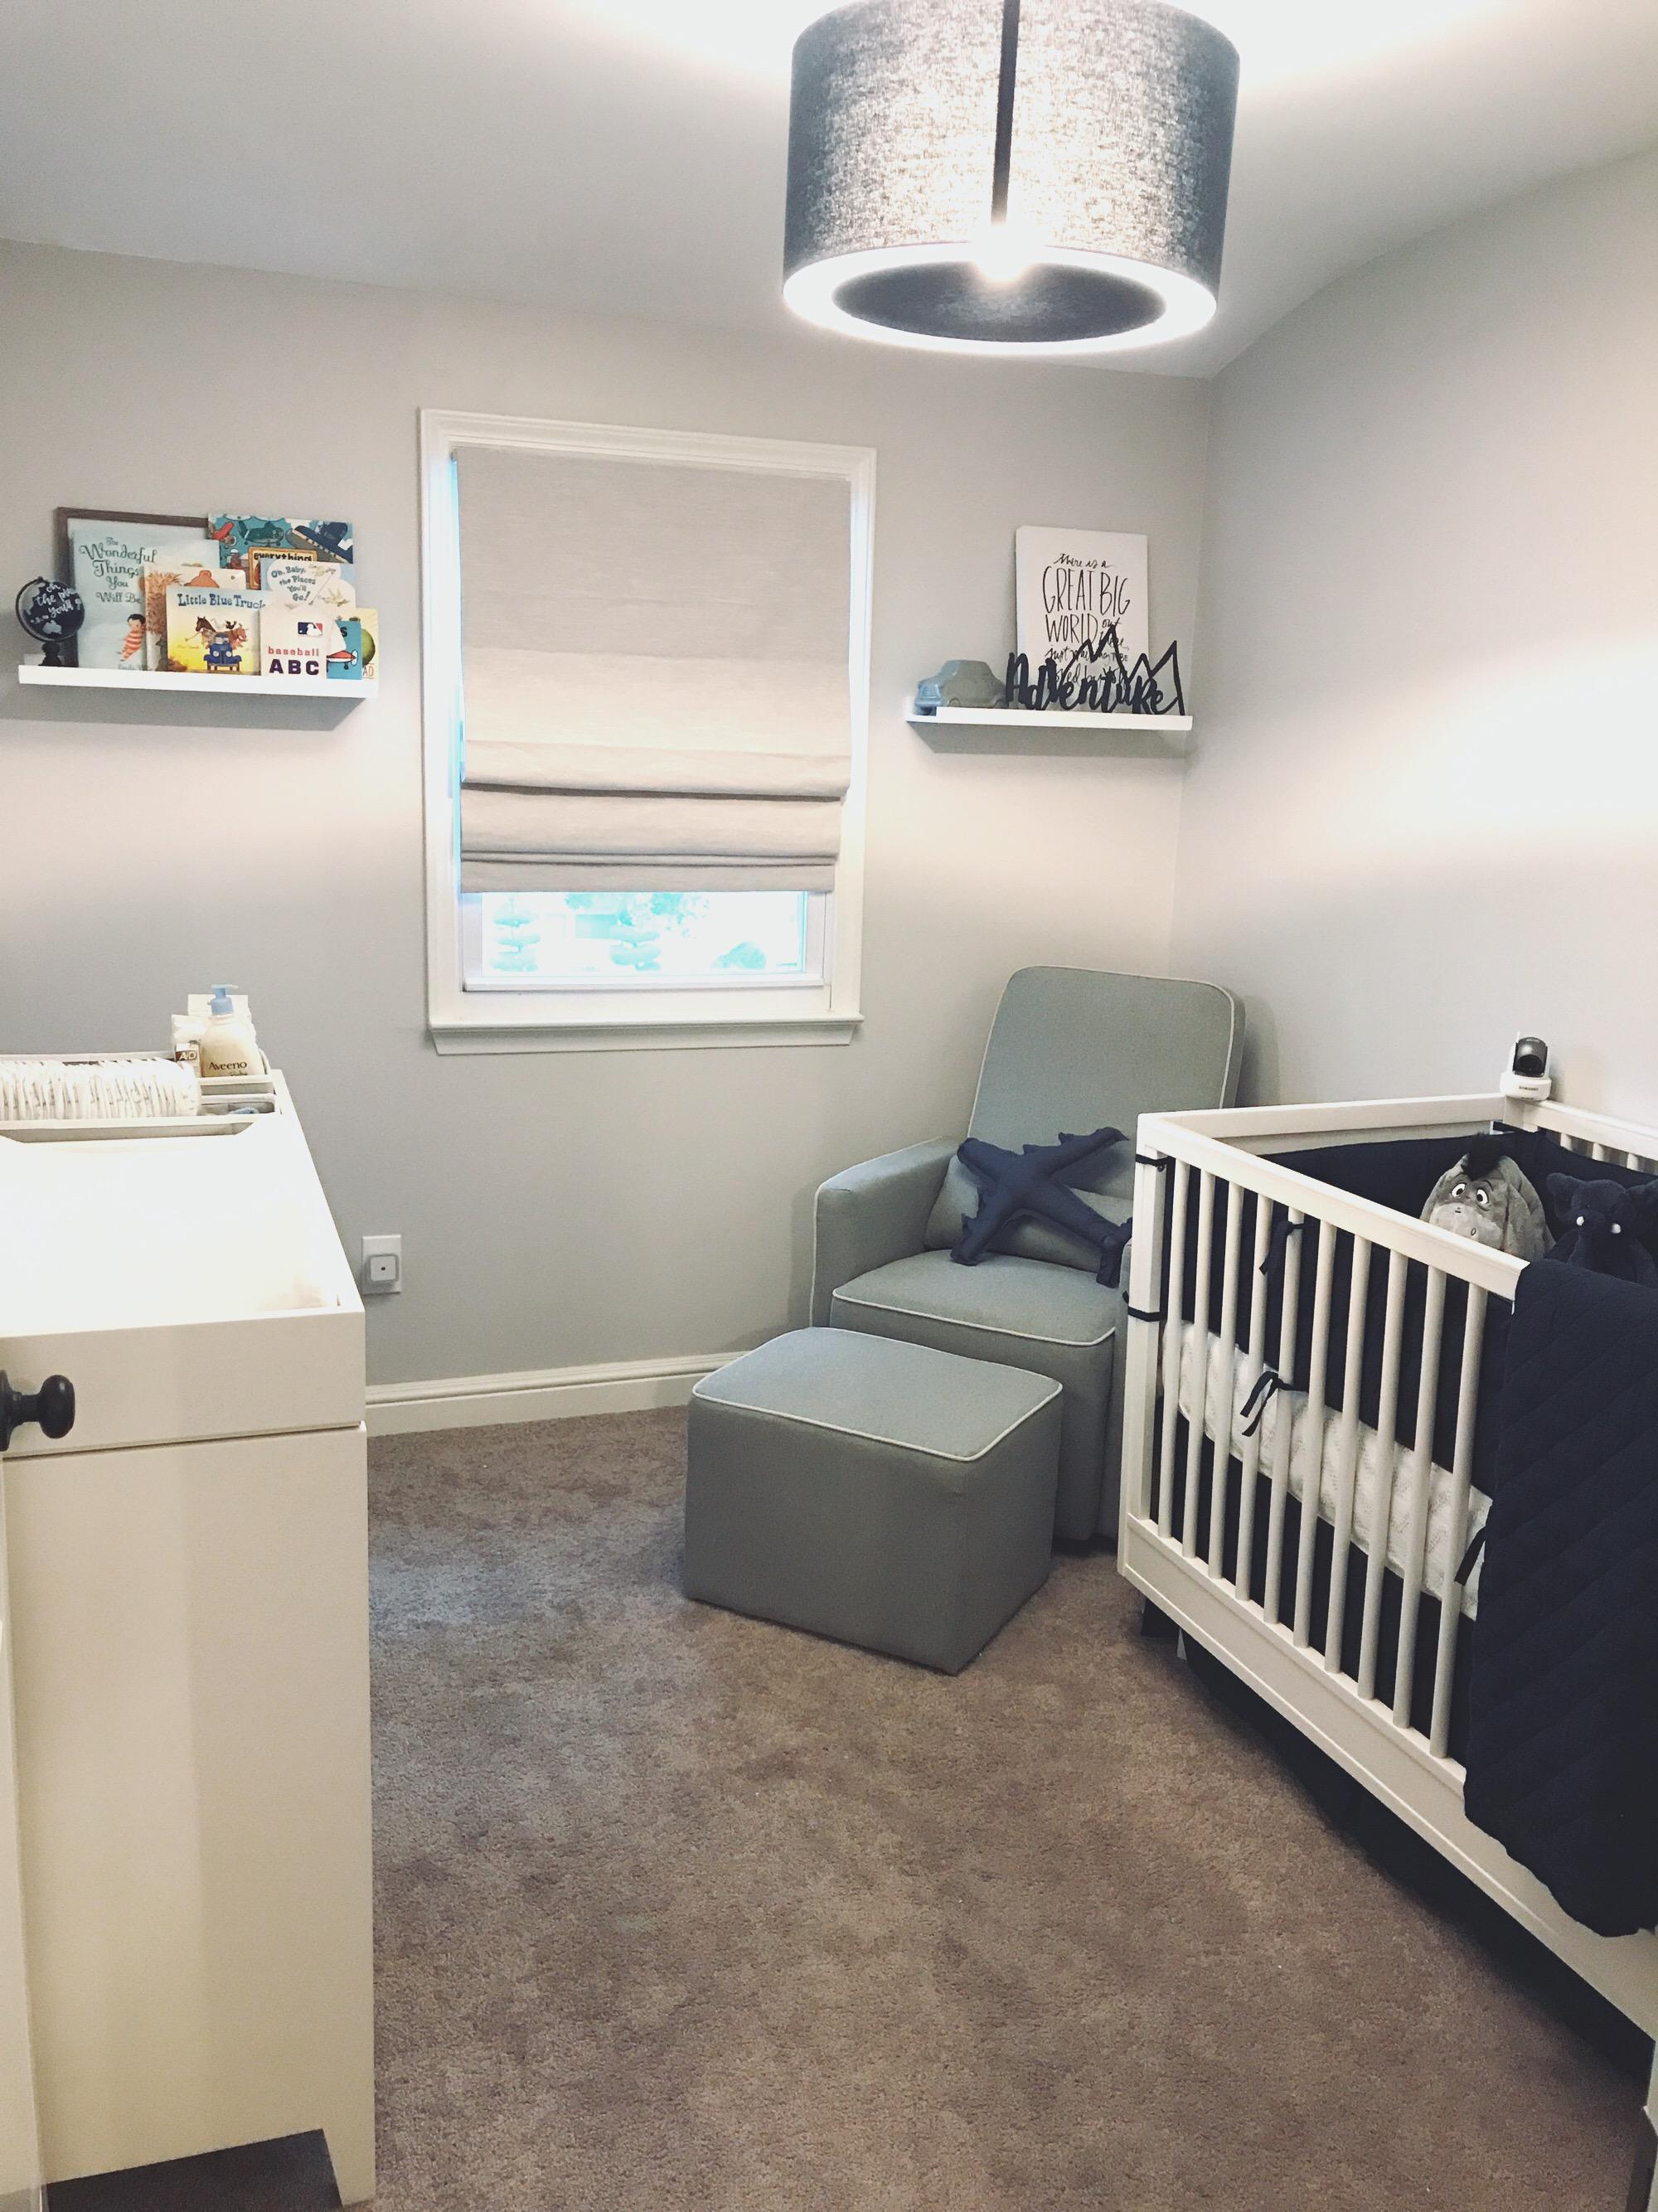 Baby Boy Bedroom Gifts: Project Nursery